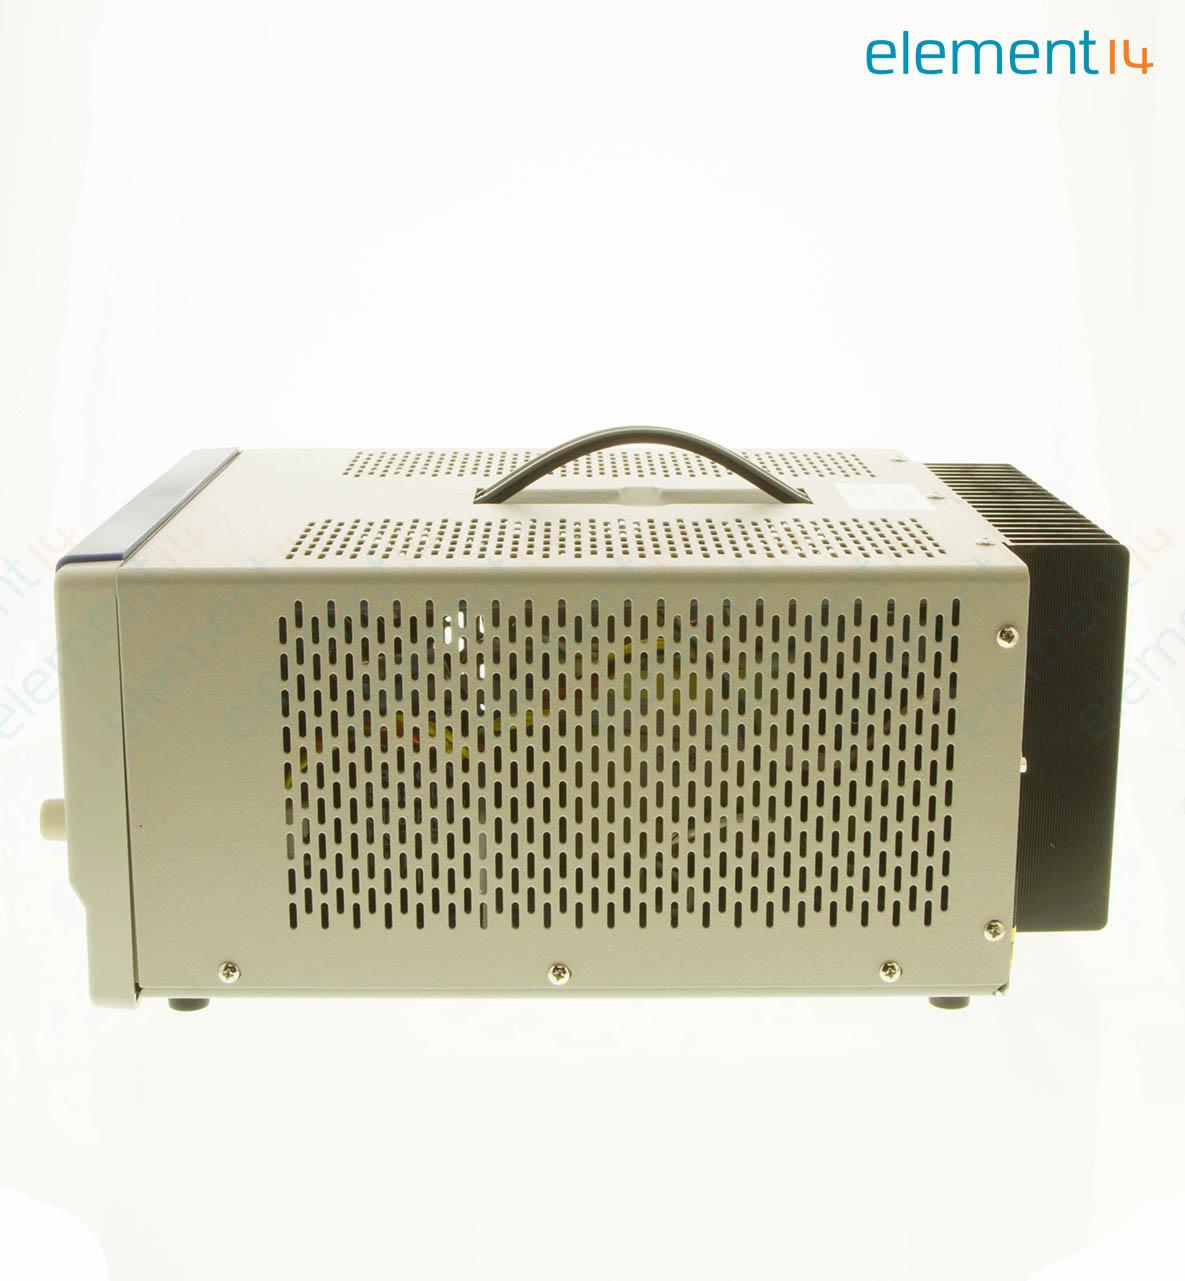 1747 B K Precision Bench Power Supply Single Adjustable 1 Output 0 V 60 V 0 A 10 A